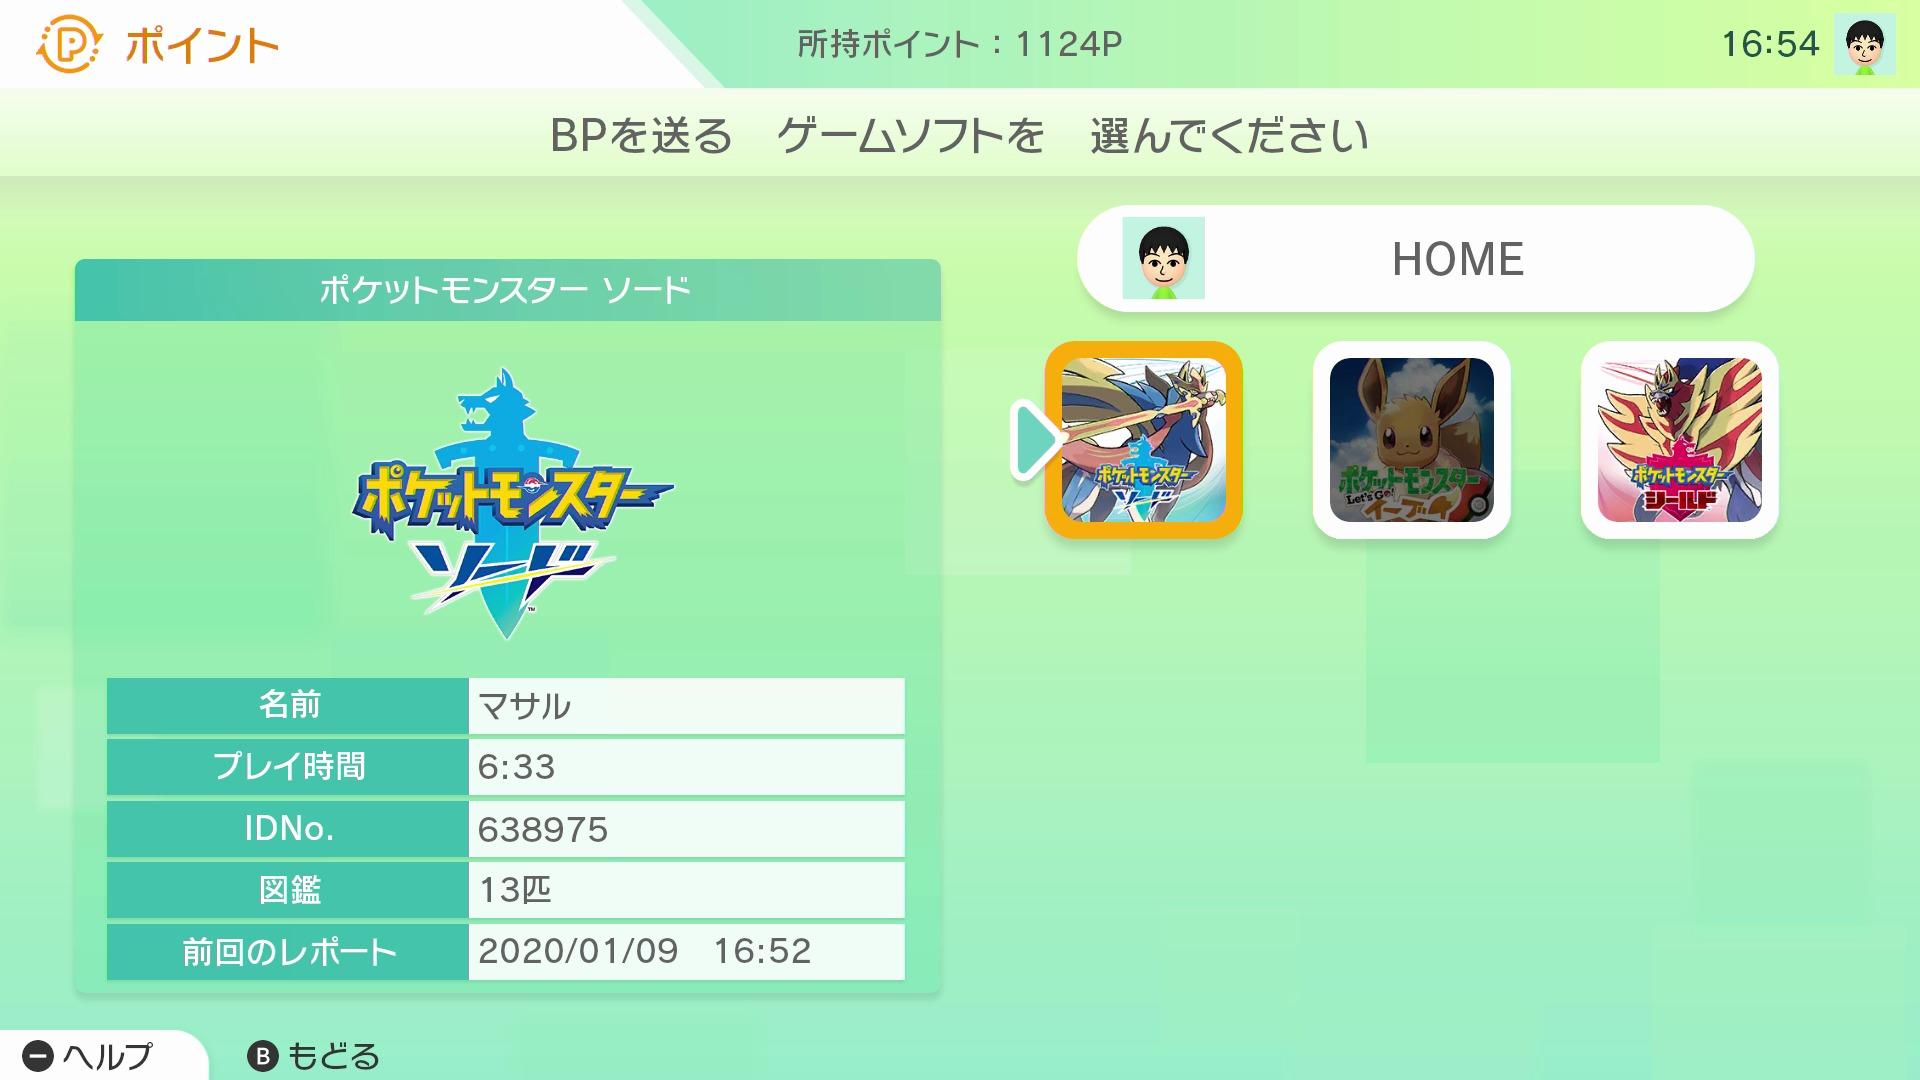 Nintendo Switchとの連携 (C)2020 Pokémon. (C)1995-2020 Nintendo/Creatures Inc. /GAME FREAK inc.